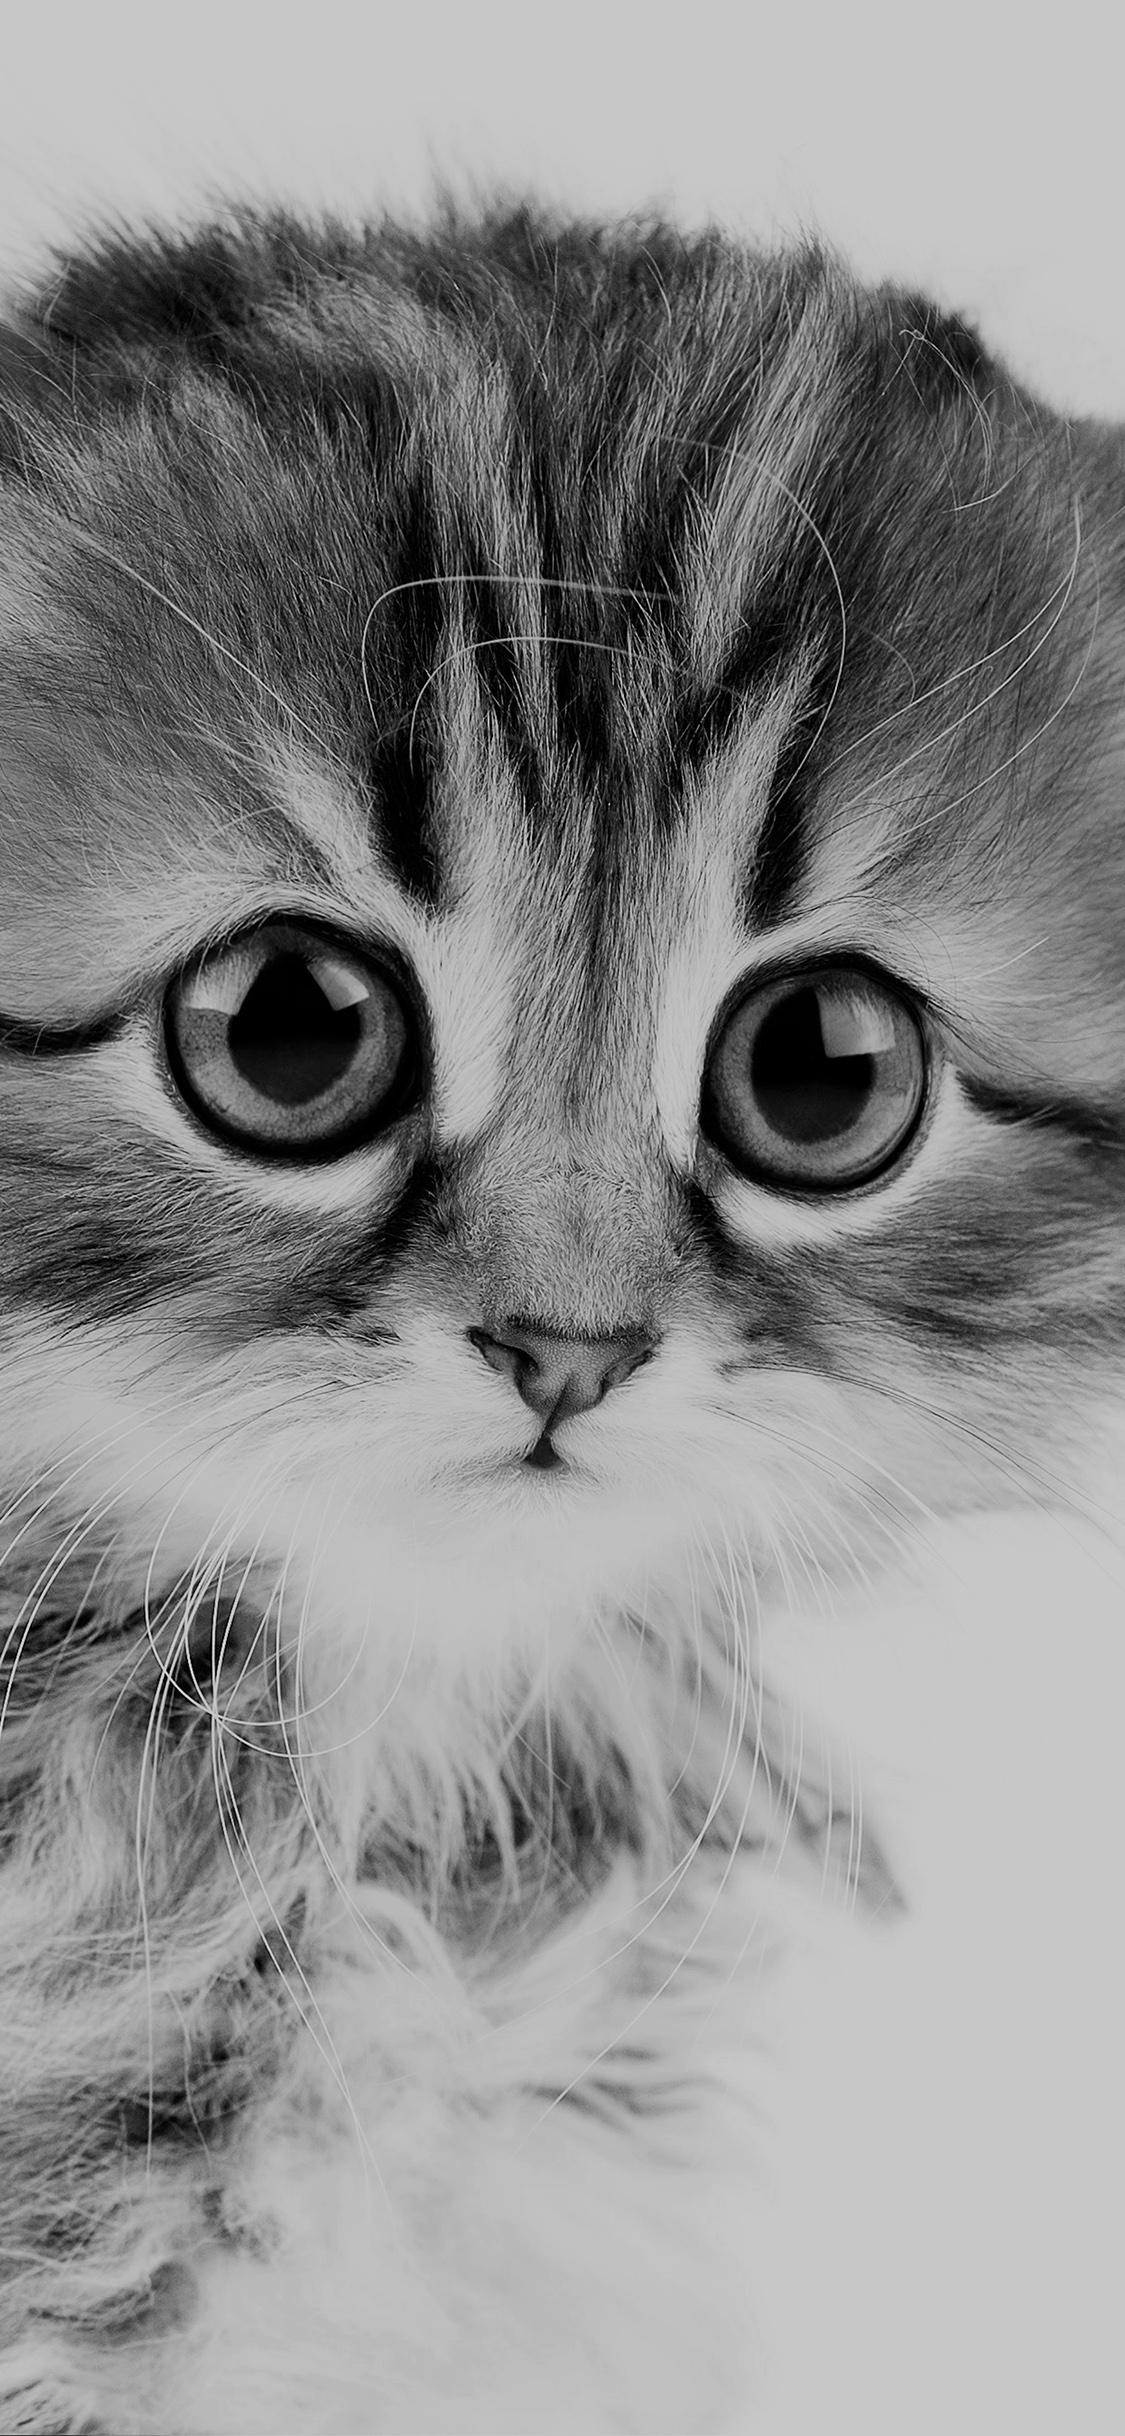 Iphonexpapers Com Iphone X Wallpaper Ms24 Sad Kitten Cat Animal Nature Cute Bw Dark